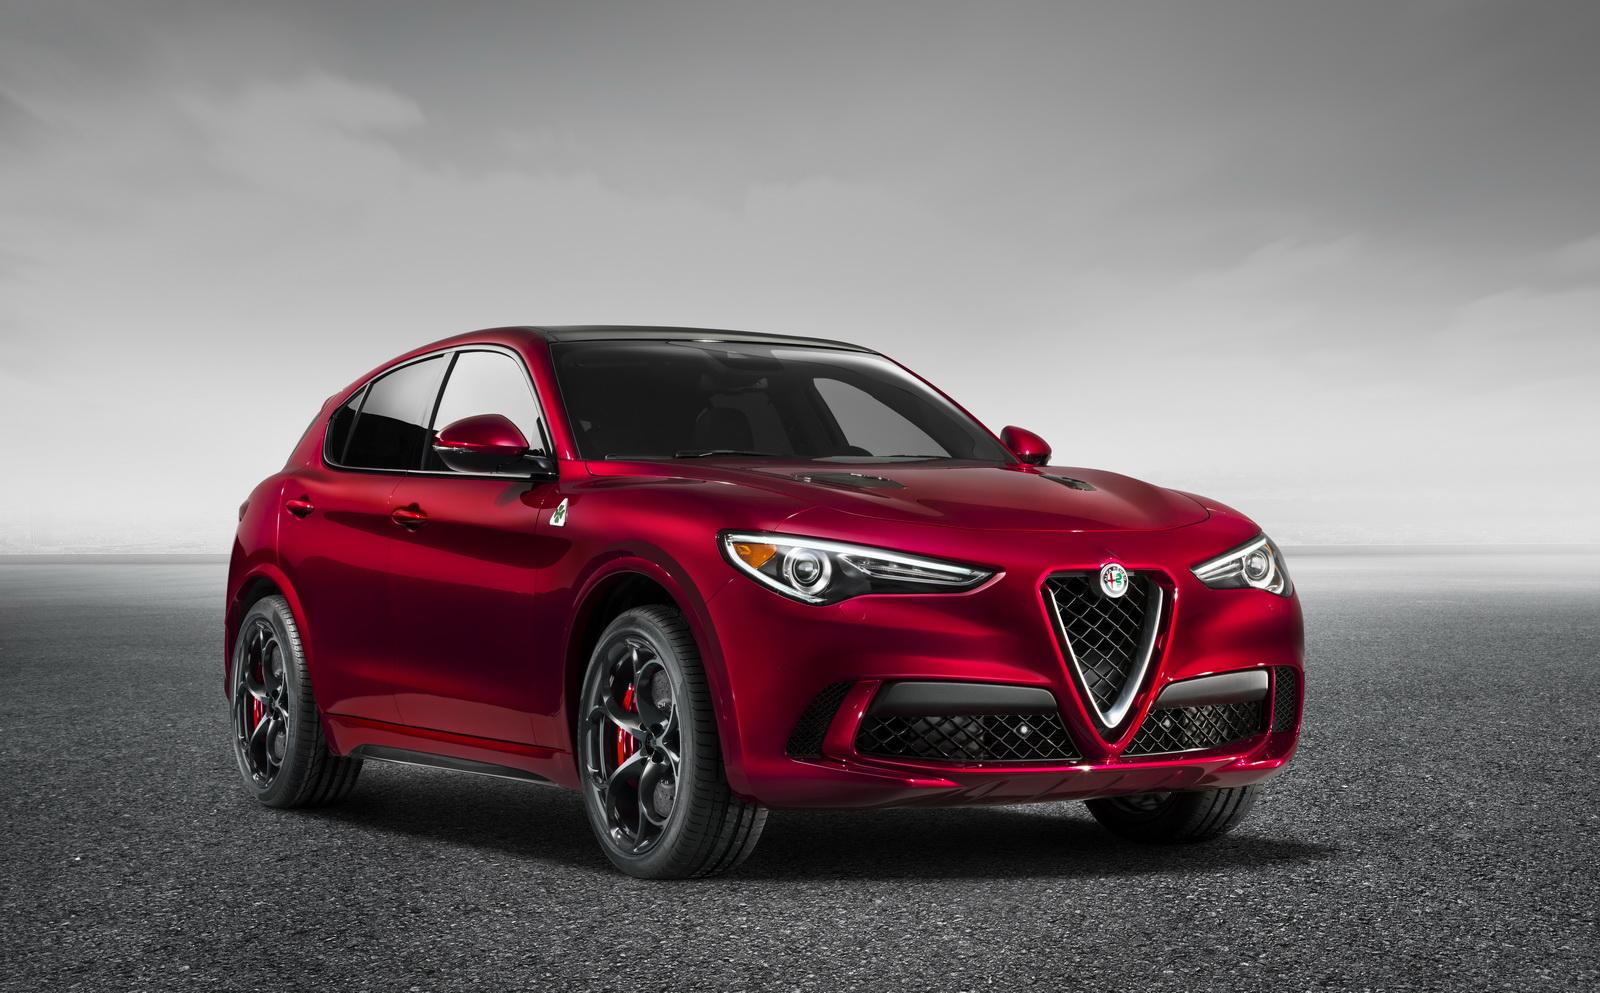 Alfa_Romeo_Stelvio_Quadrifoglio_01.jpg